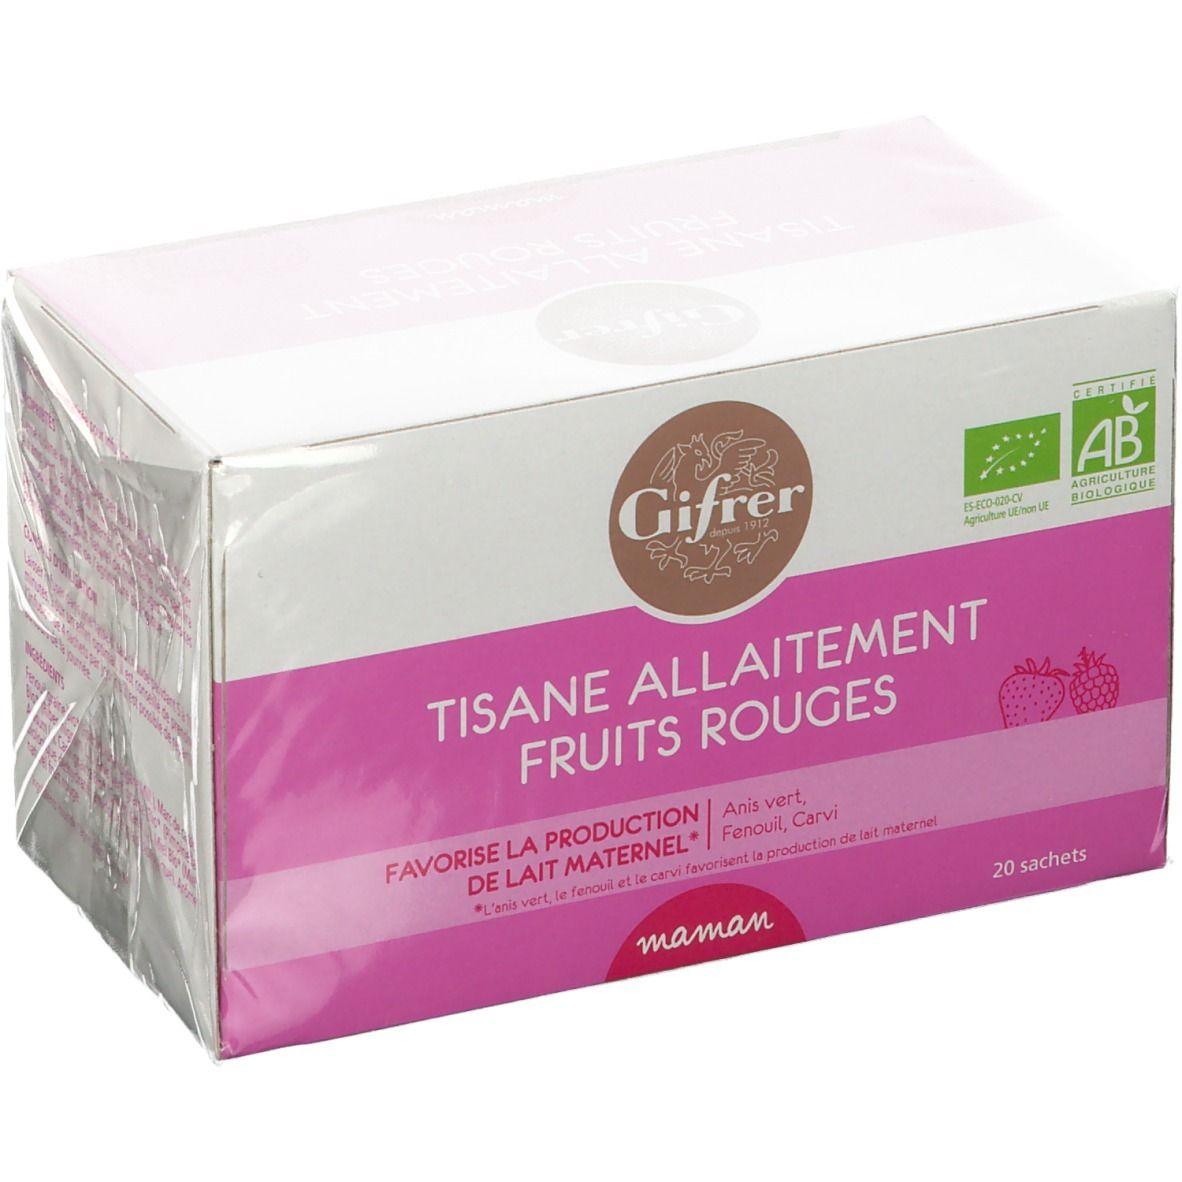 Gifrer Tisane allaitement fruits rouges